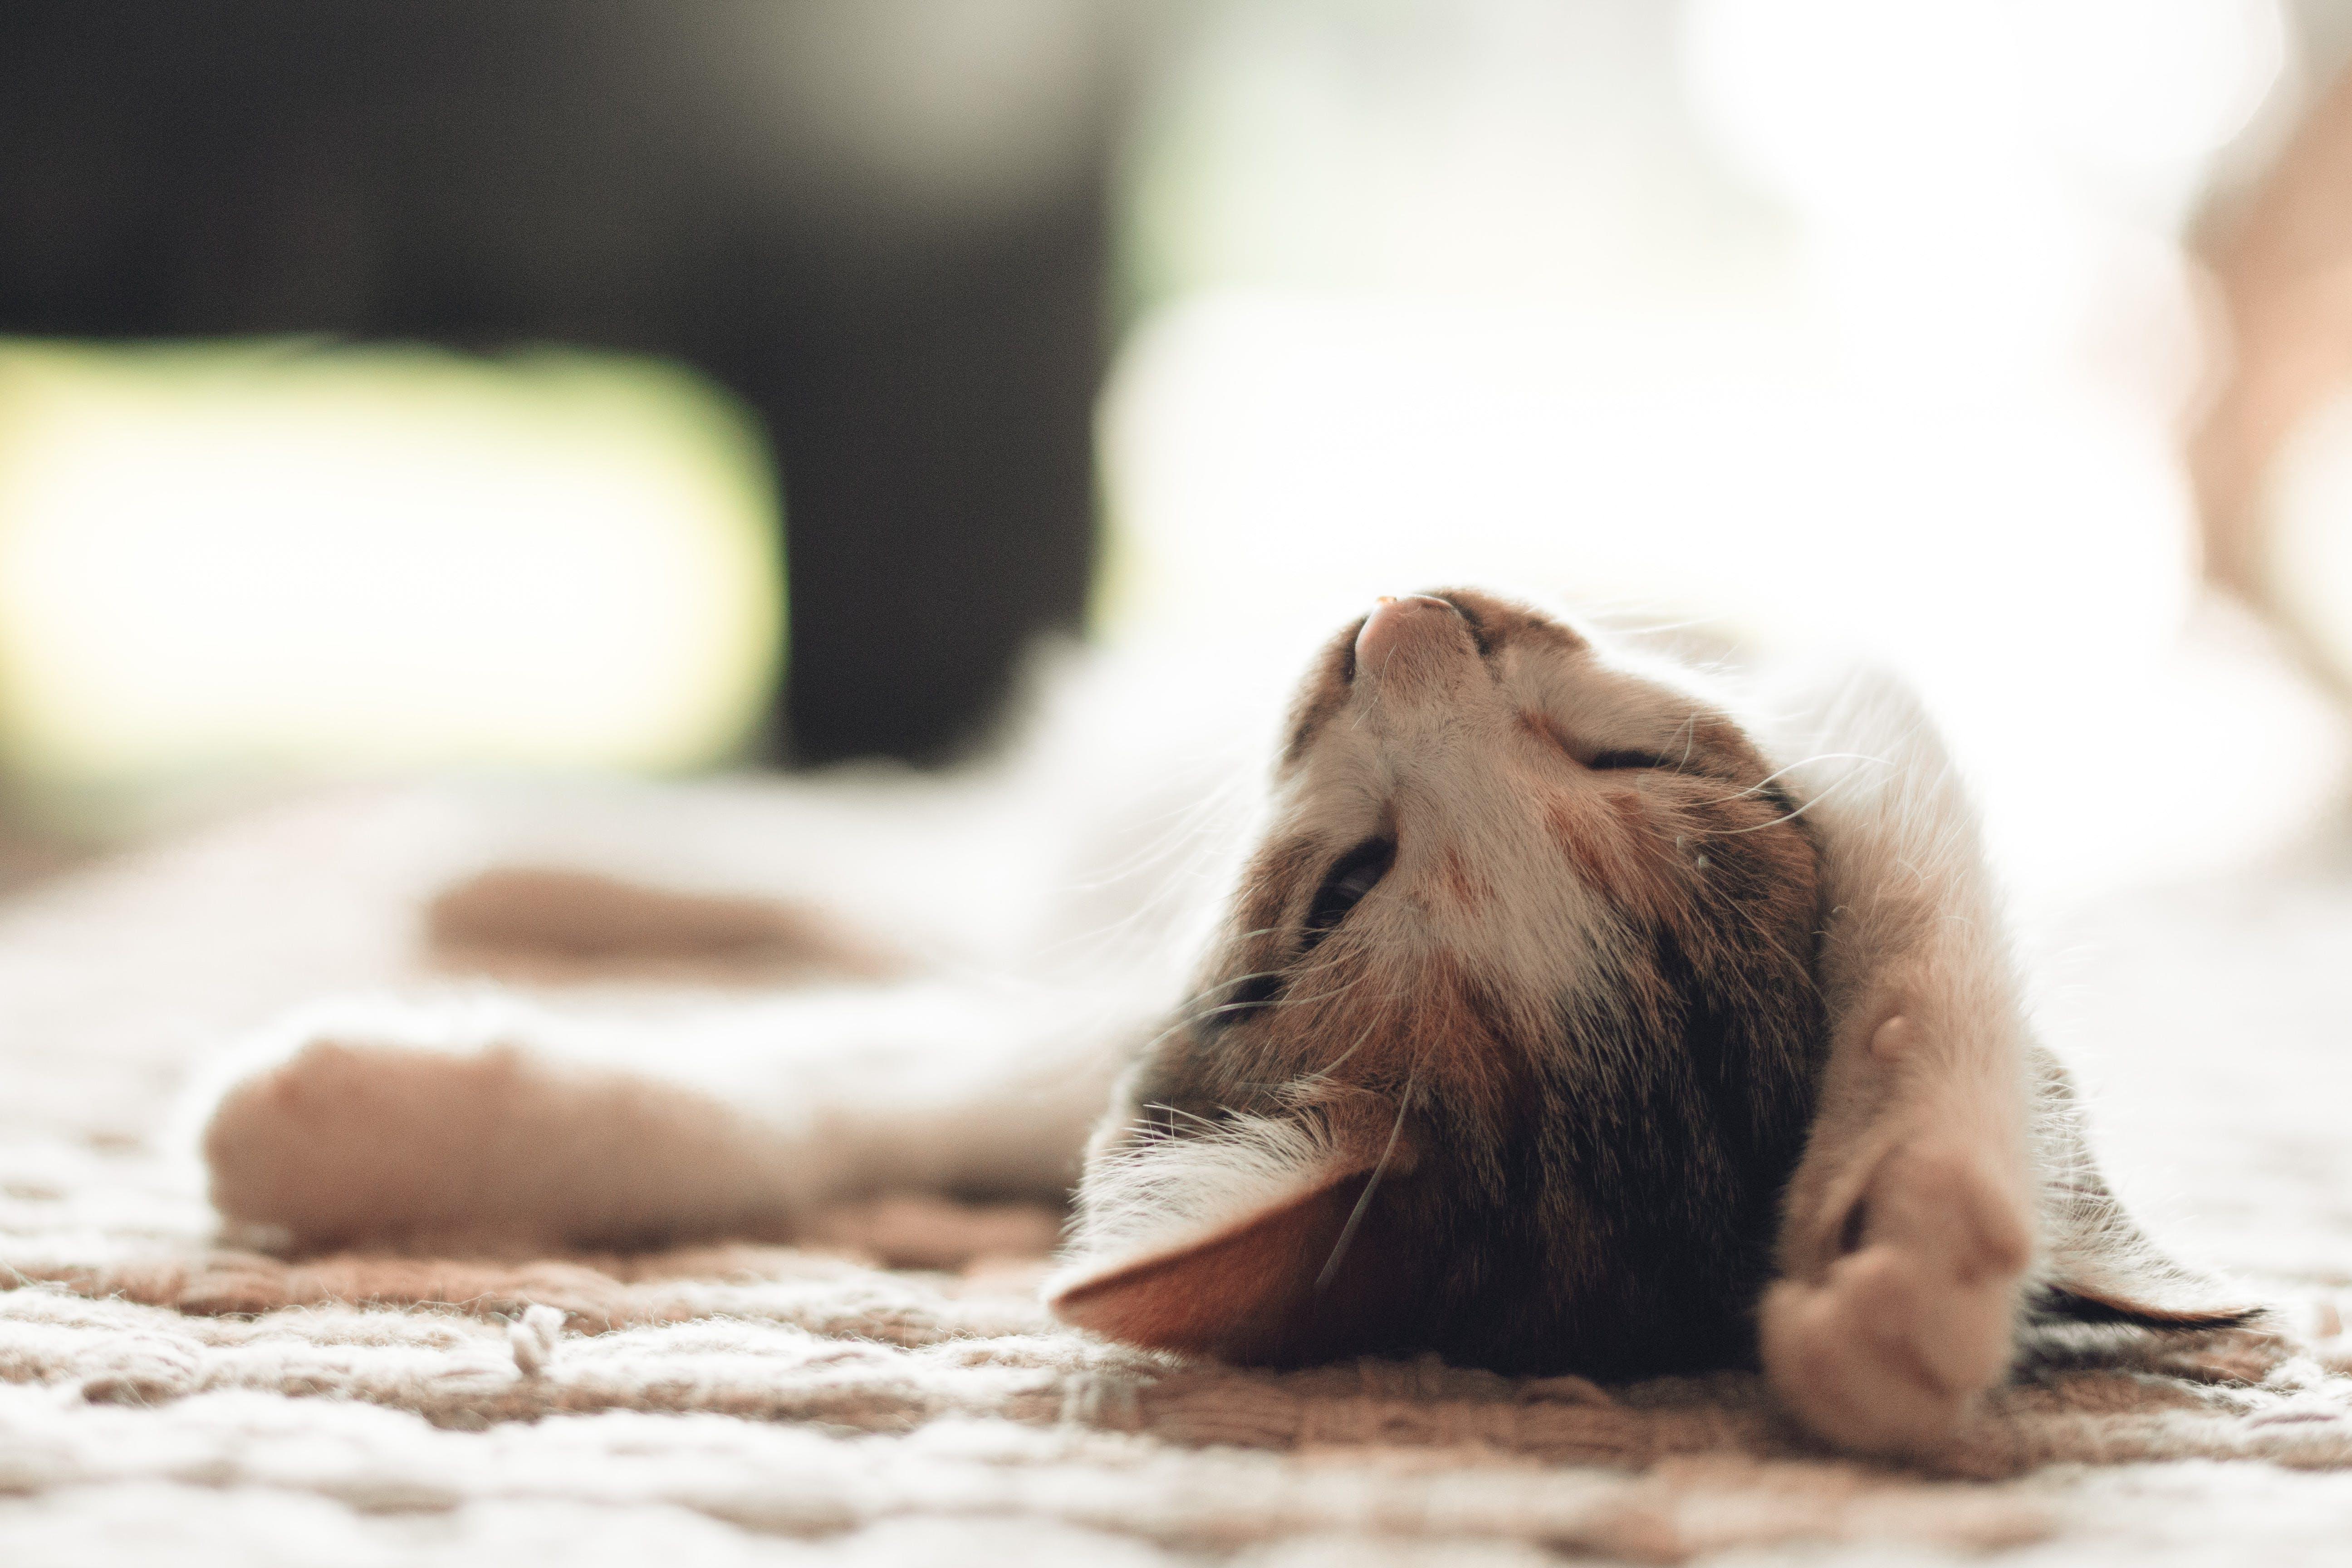 A lazy cat